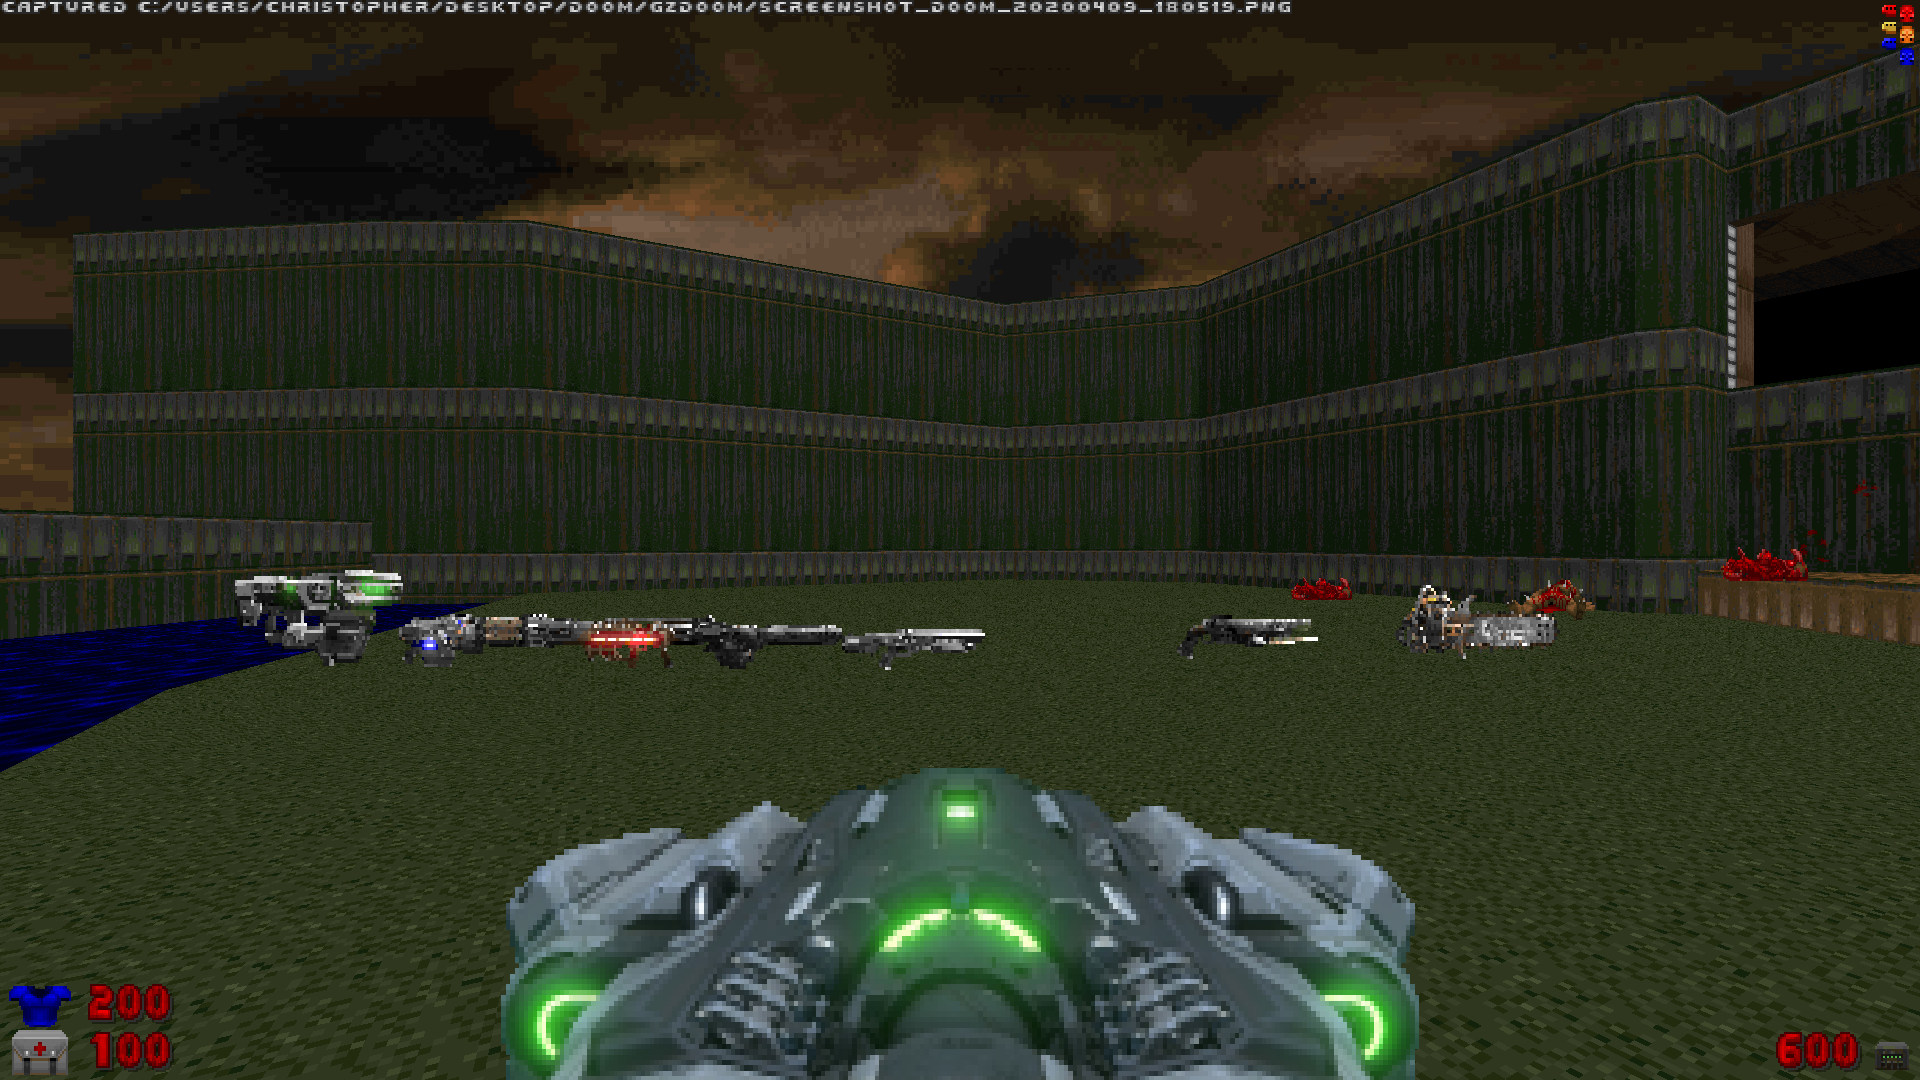 Screenshot_Doom_20200409_180521.png.7b4c6c40f00435e158e507ed95e16866.png